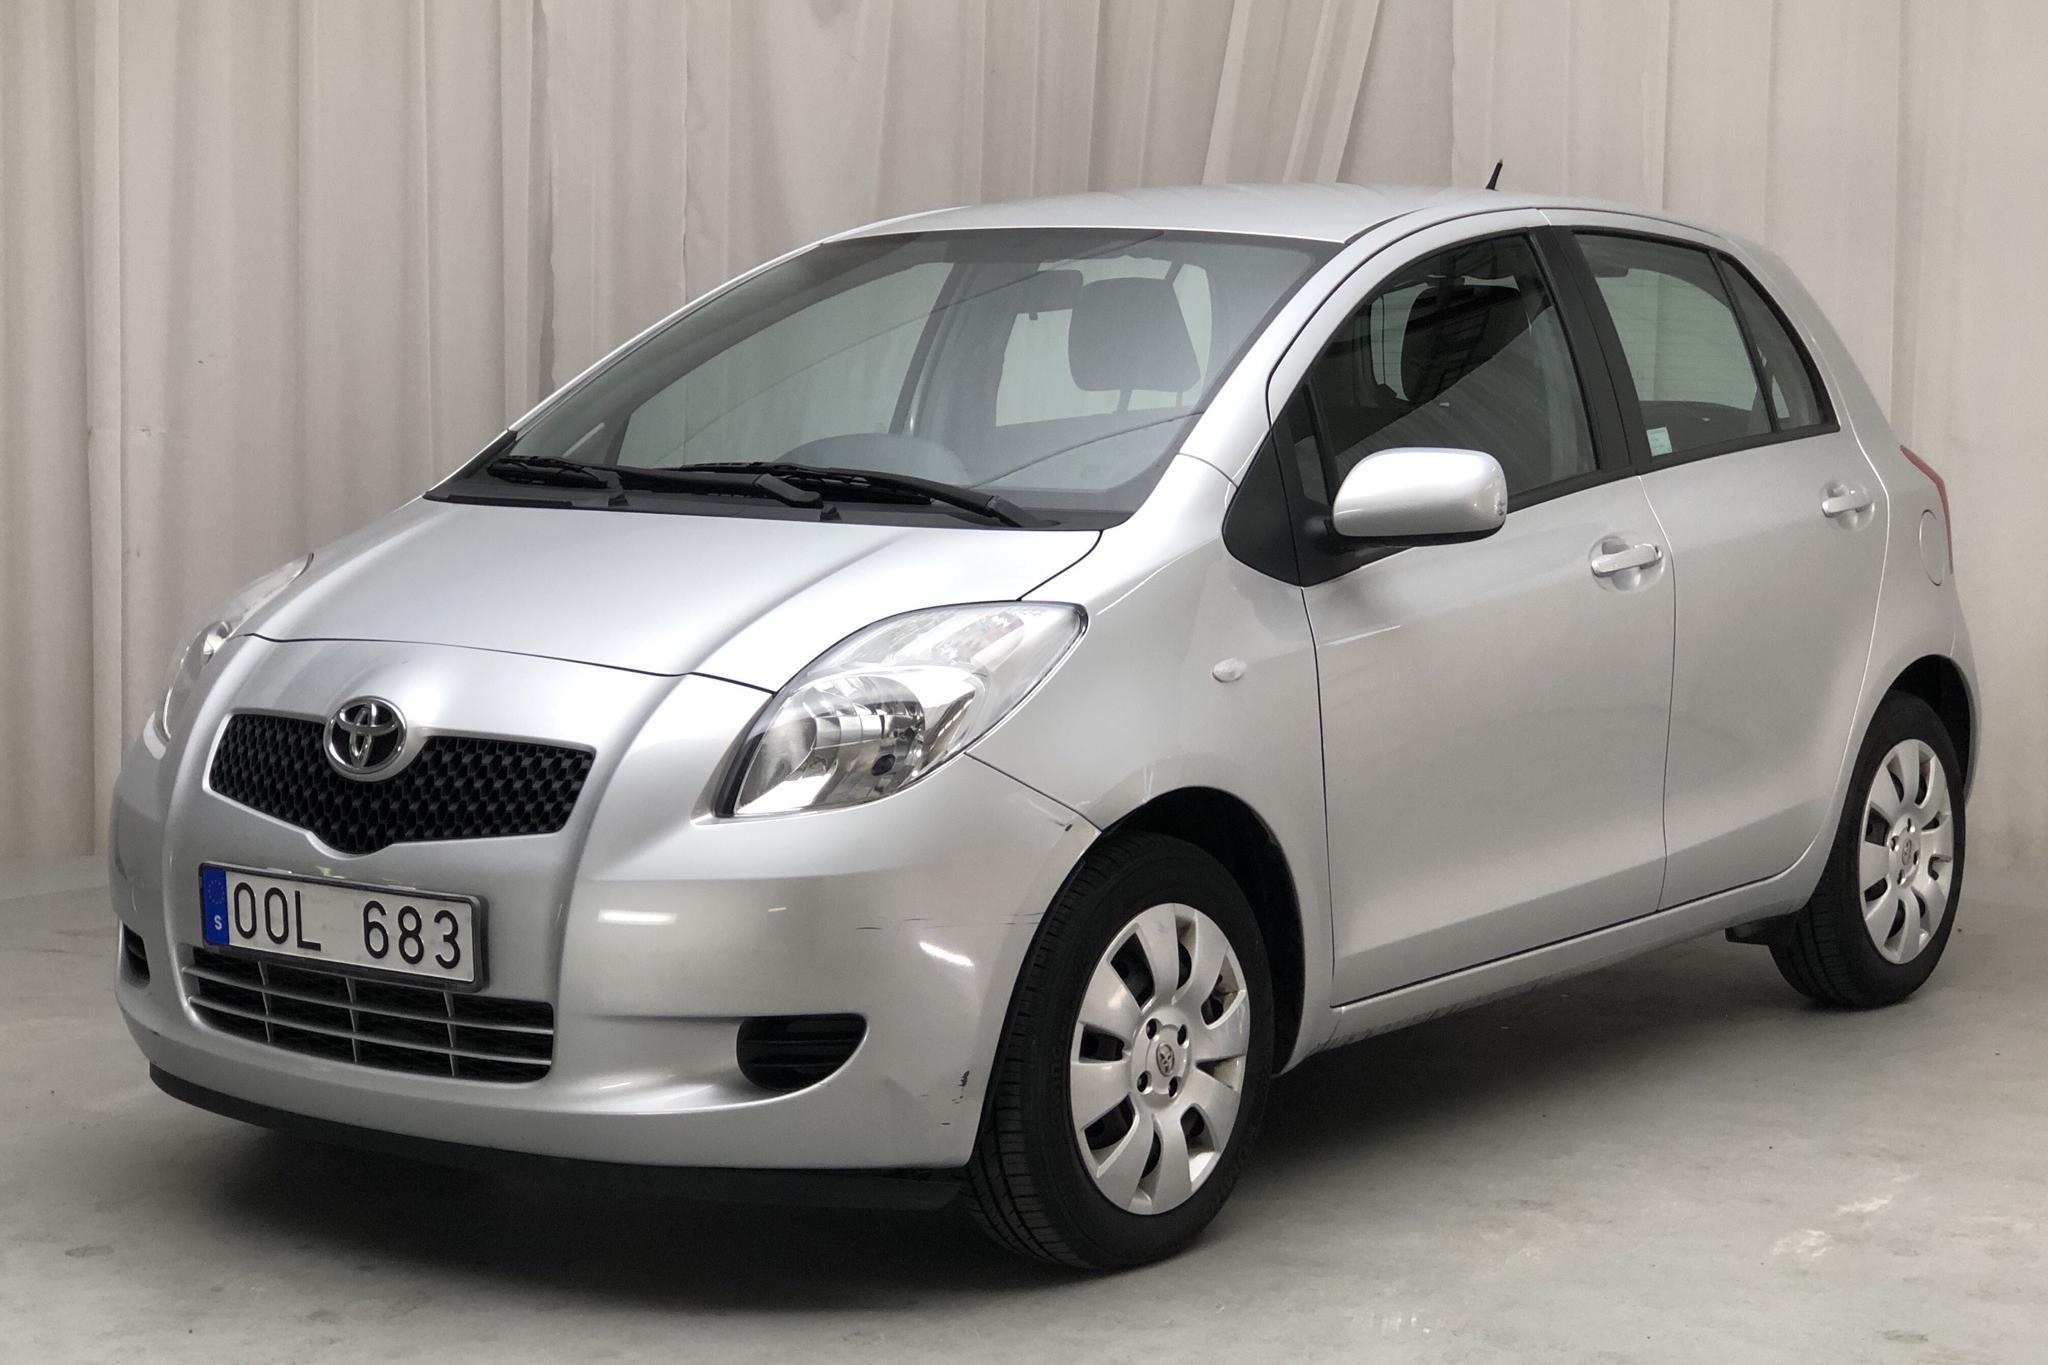 Toyota Yaris 1.0 5dr (69hk) - 41 700 km - Manual - silver - 2007